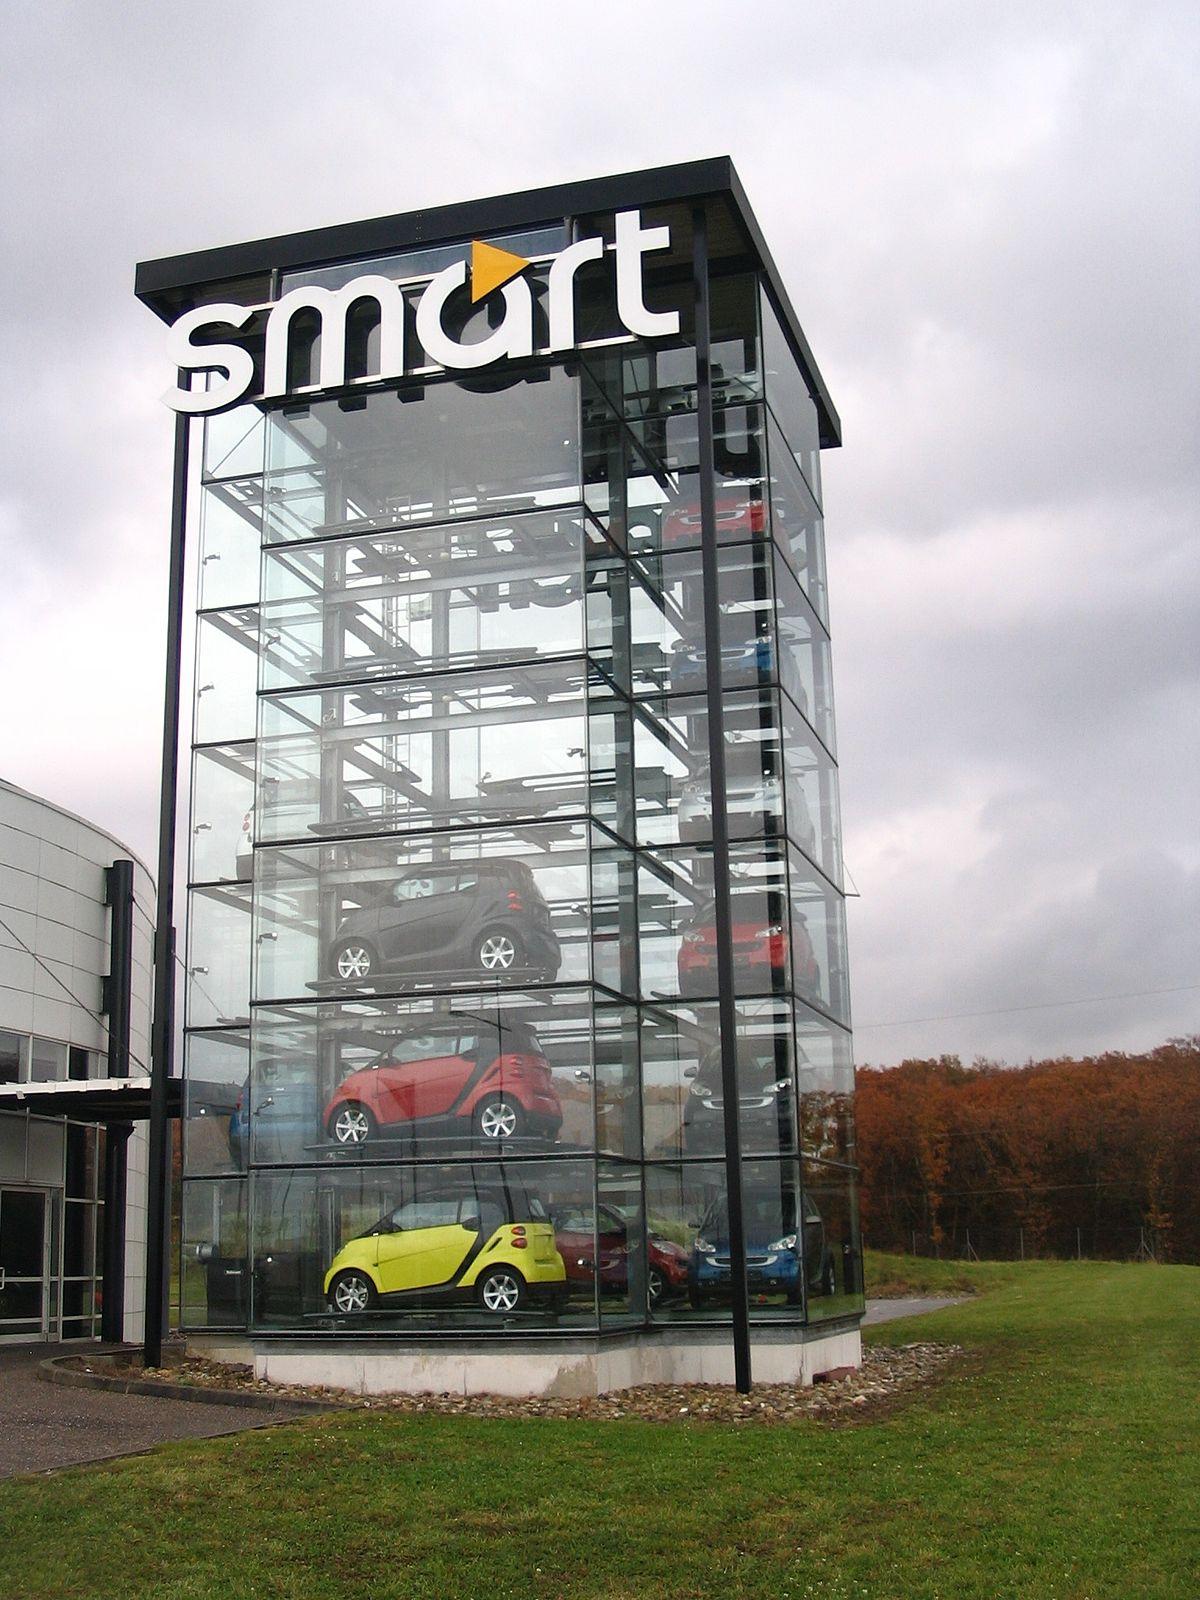 Smart (automobil) – Wikipedie